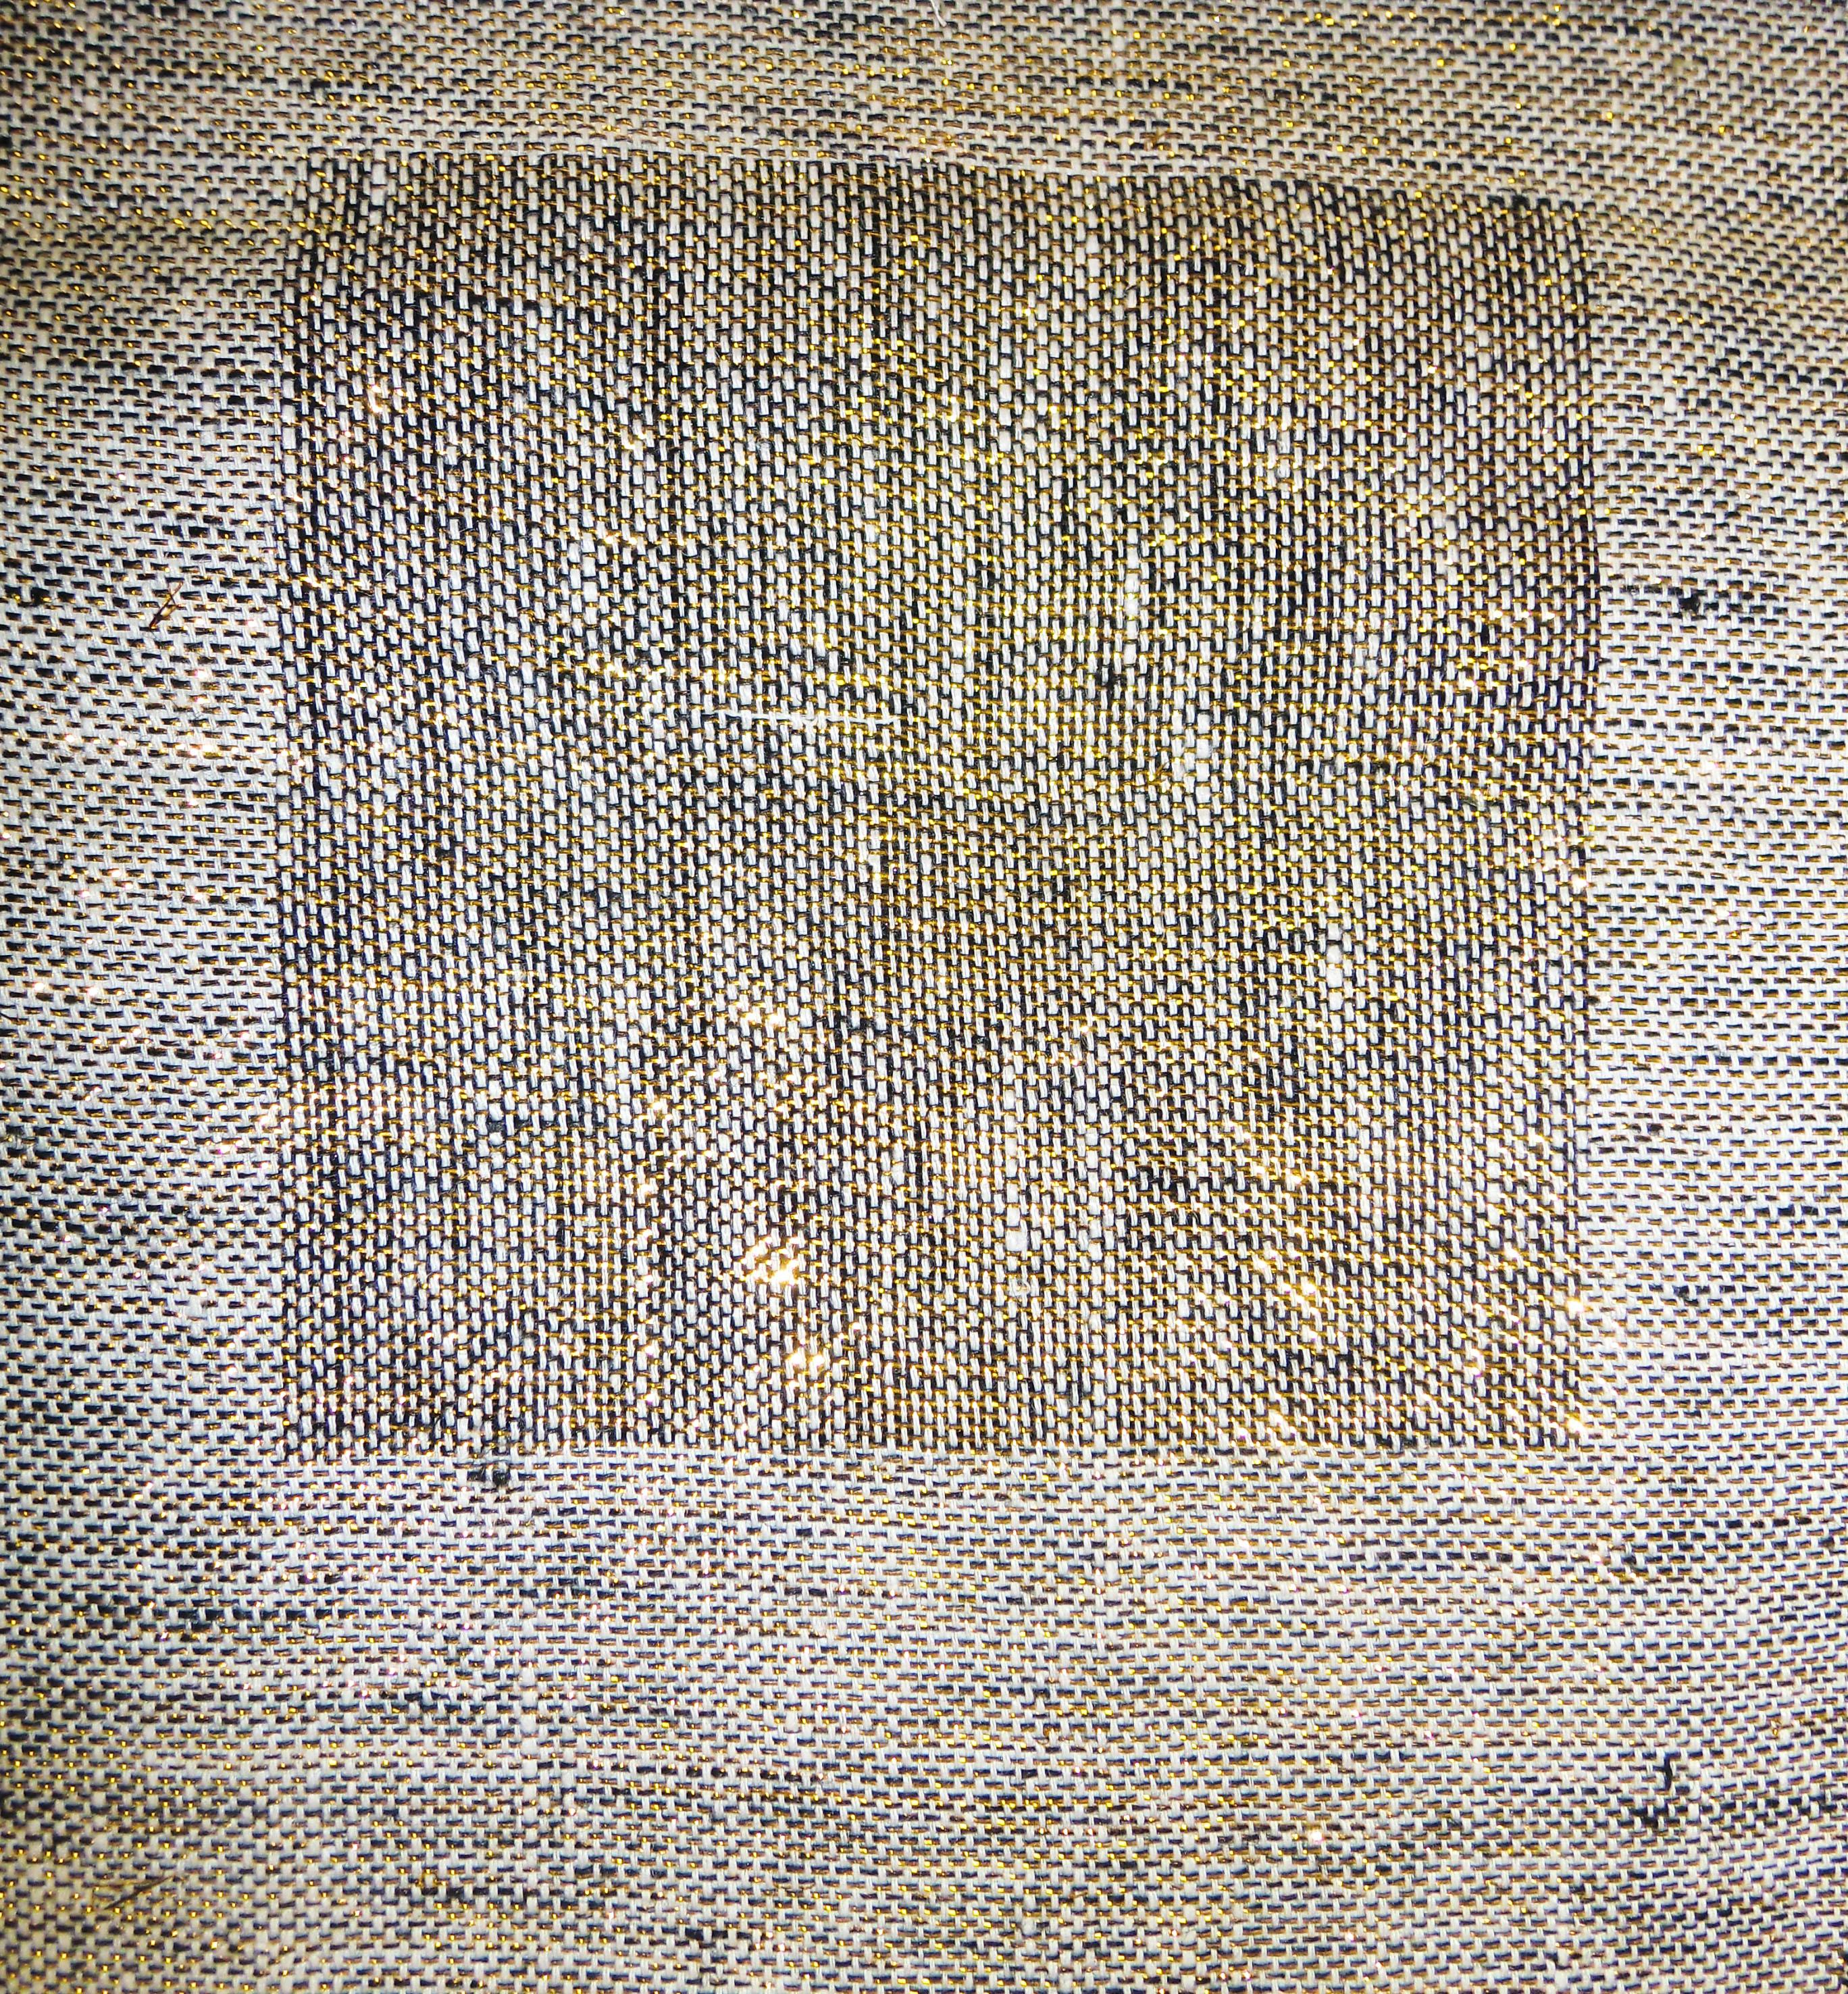 Norbar Fabrics Lanfair Linen 27